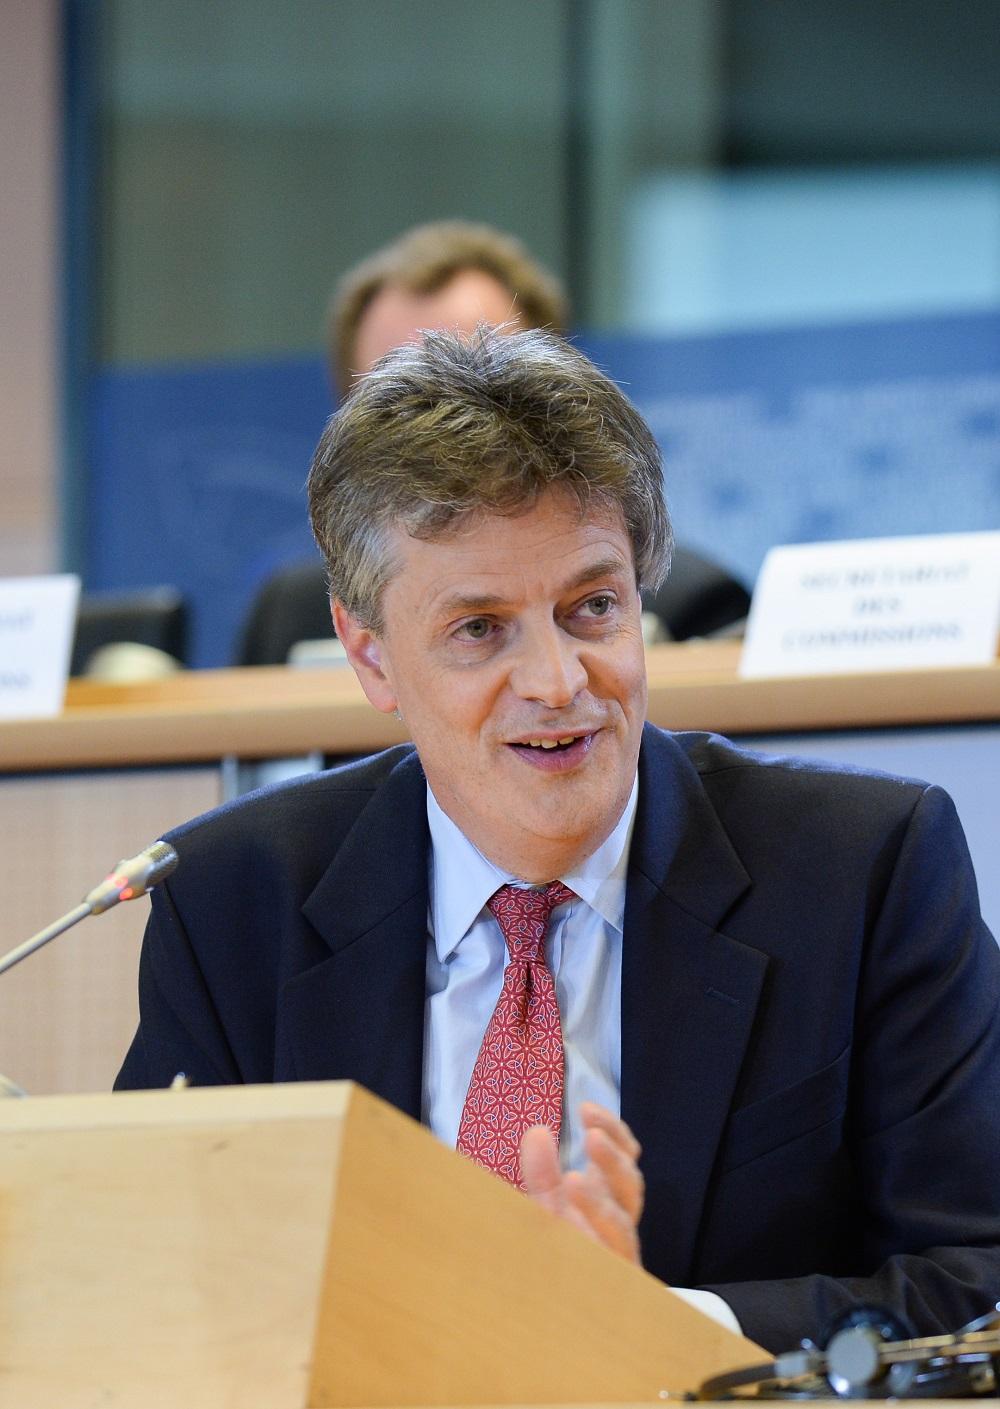 Besonders charmant: der Brite Jonathan Hill © European Union, 2014